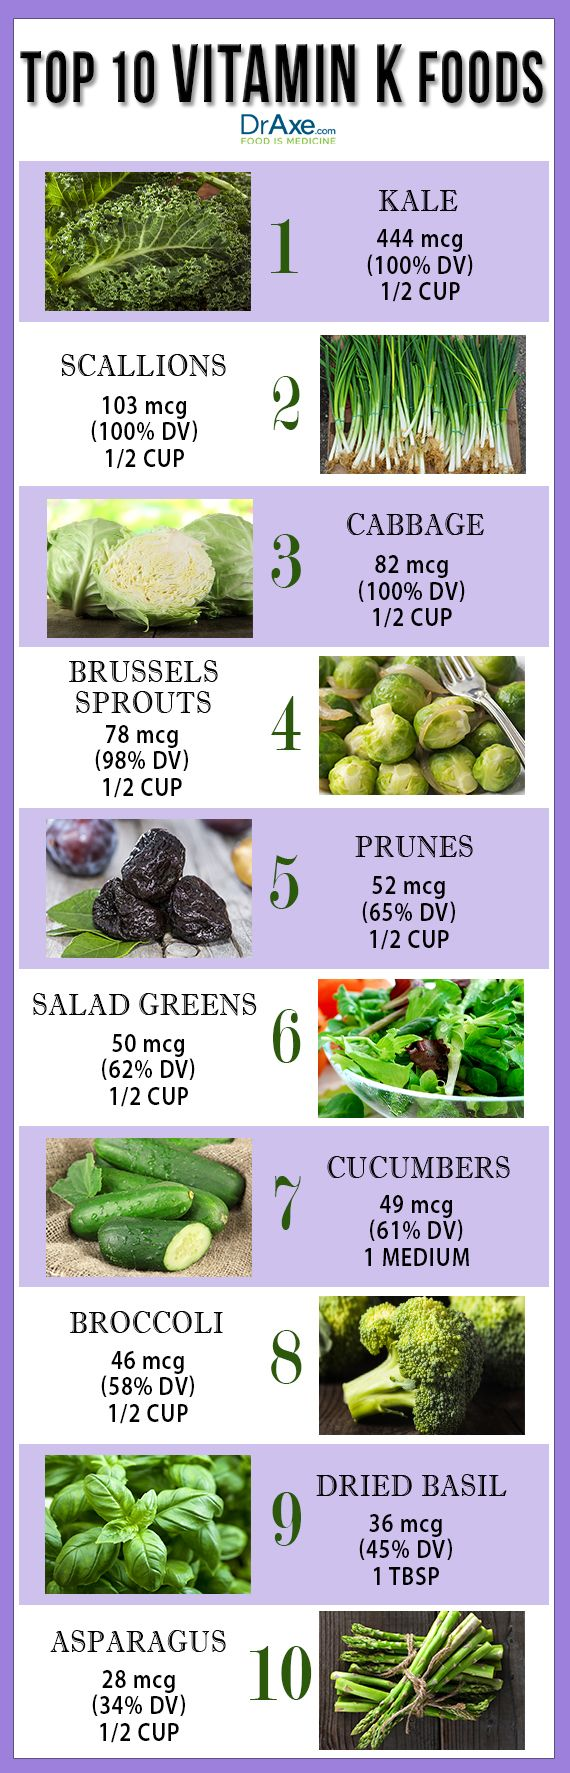 Top 10 Vitamin K Rich Foods Heart disease